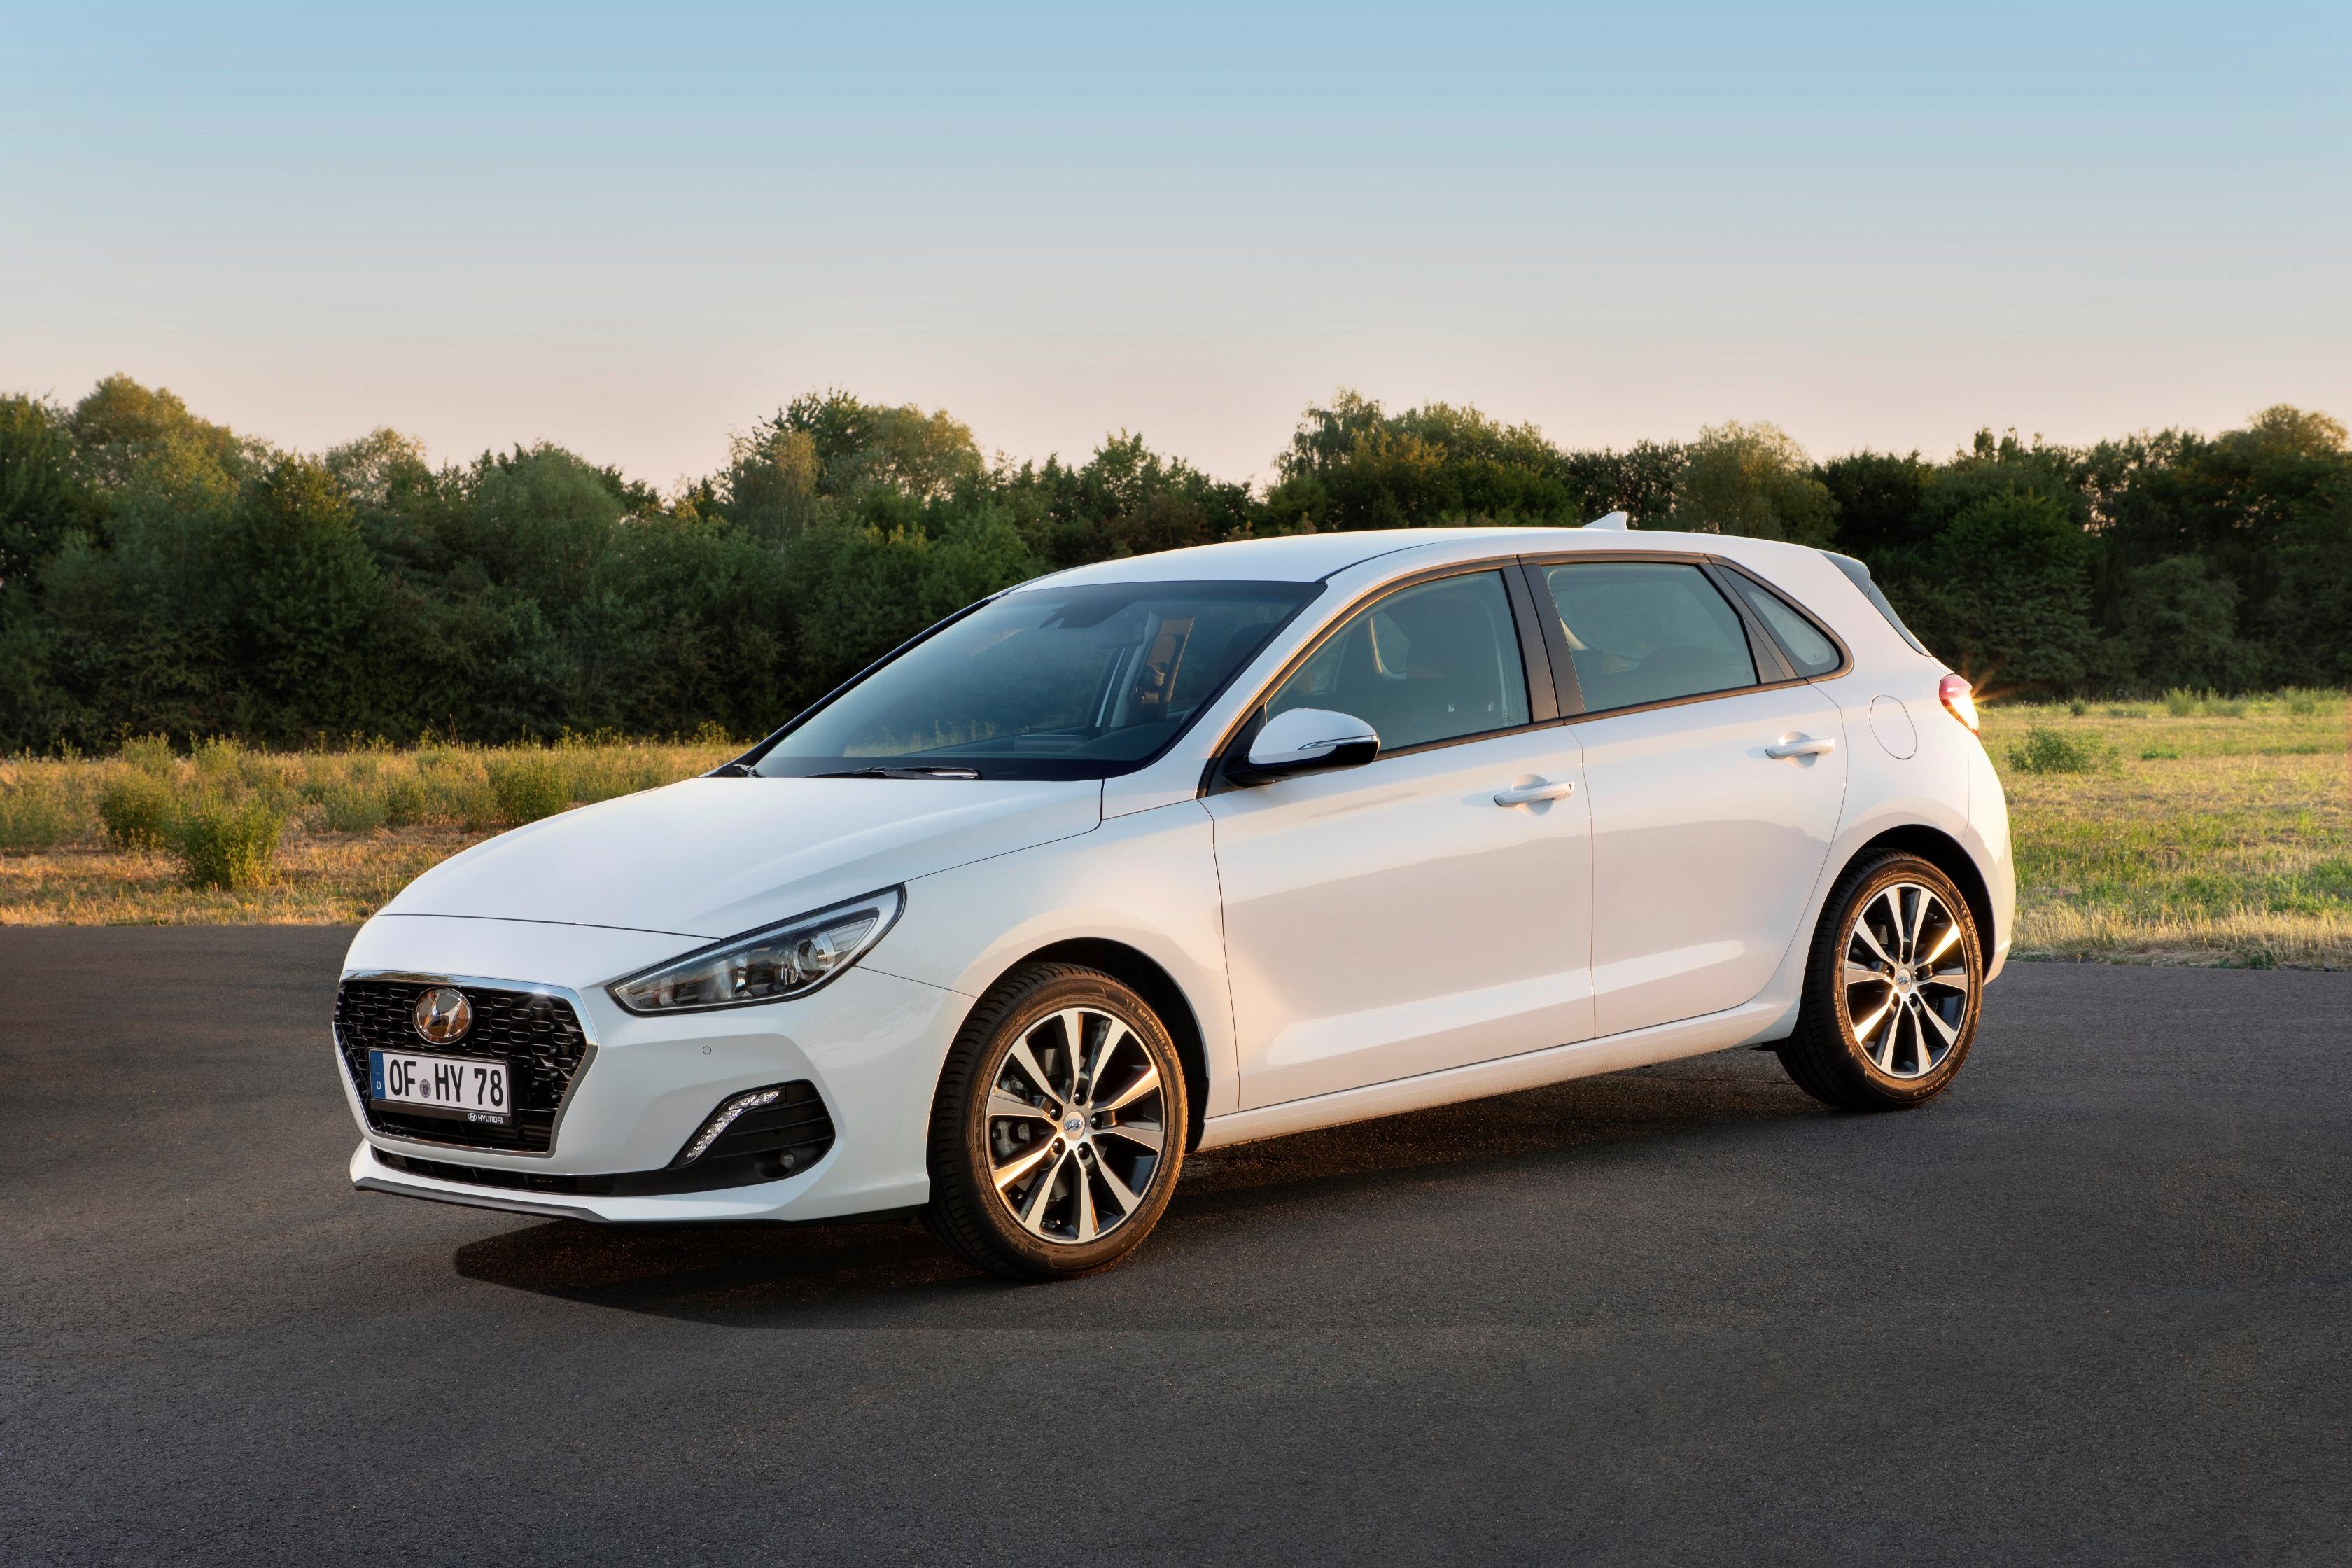 2019 Hyundai i30 Facelifted: Smartstream Engine, 8